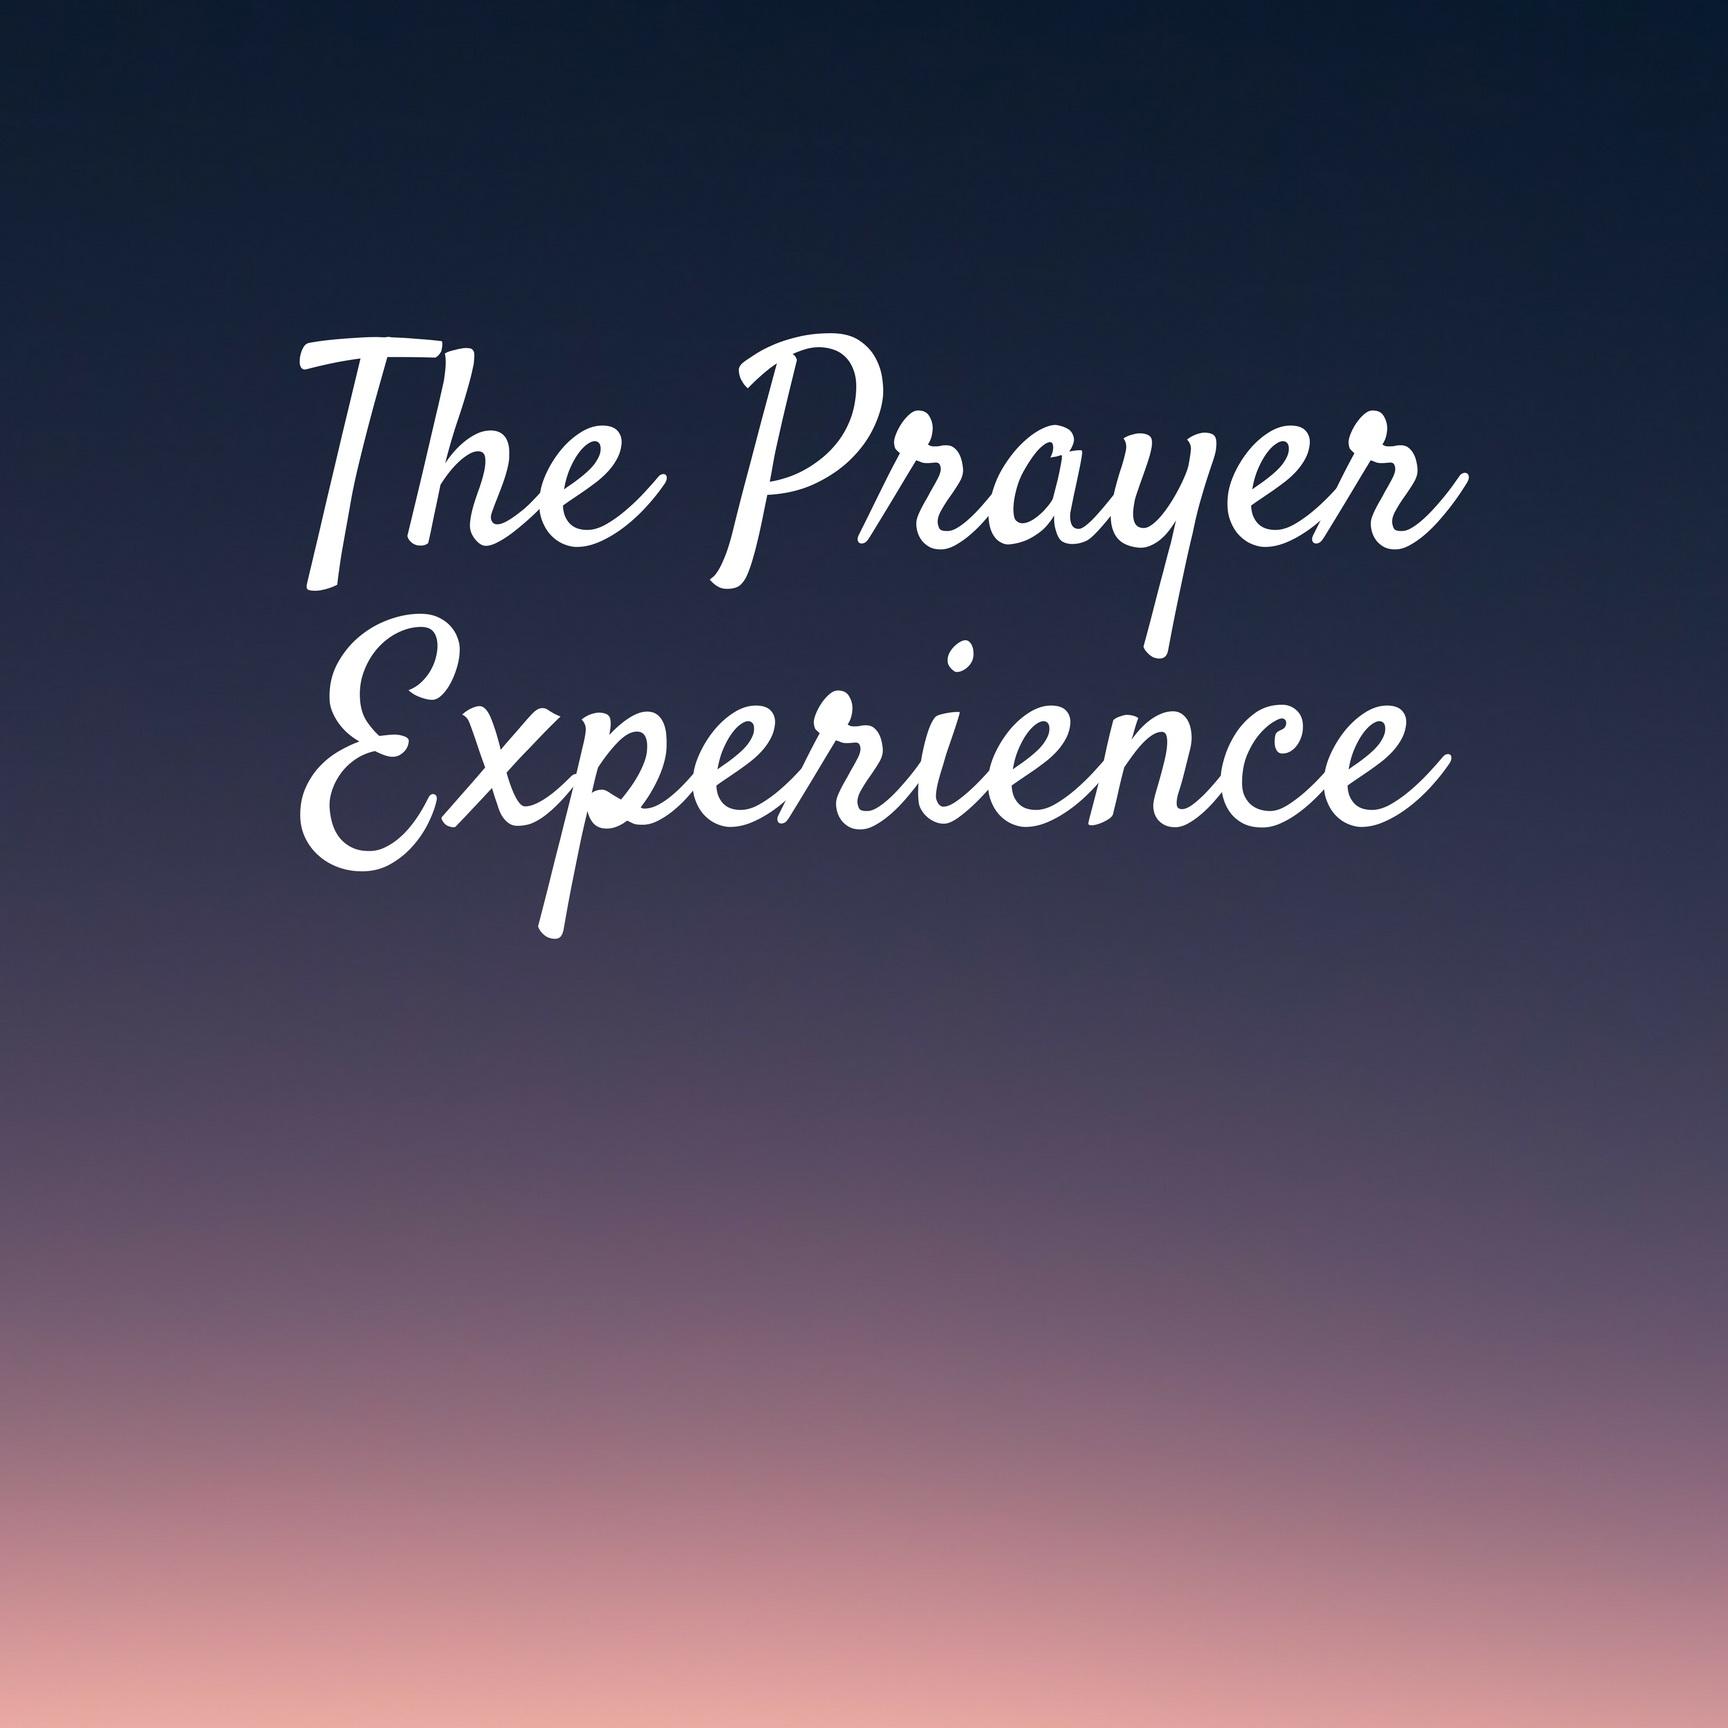 The+Prayer+Experience+Graphic+%281%29.jpg